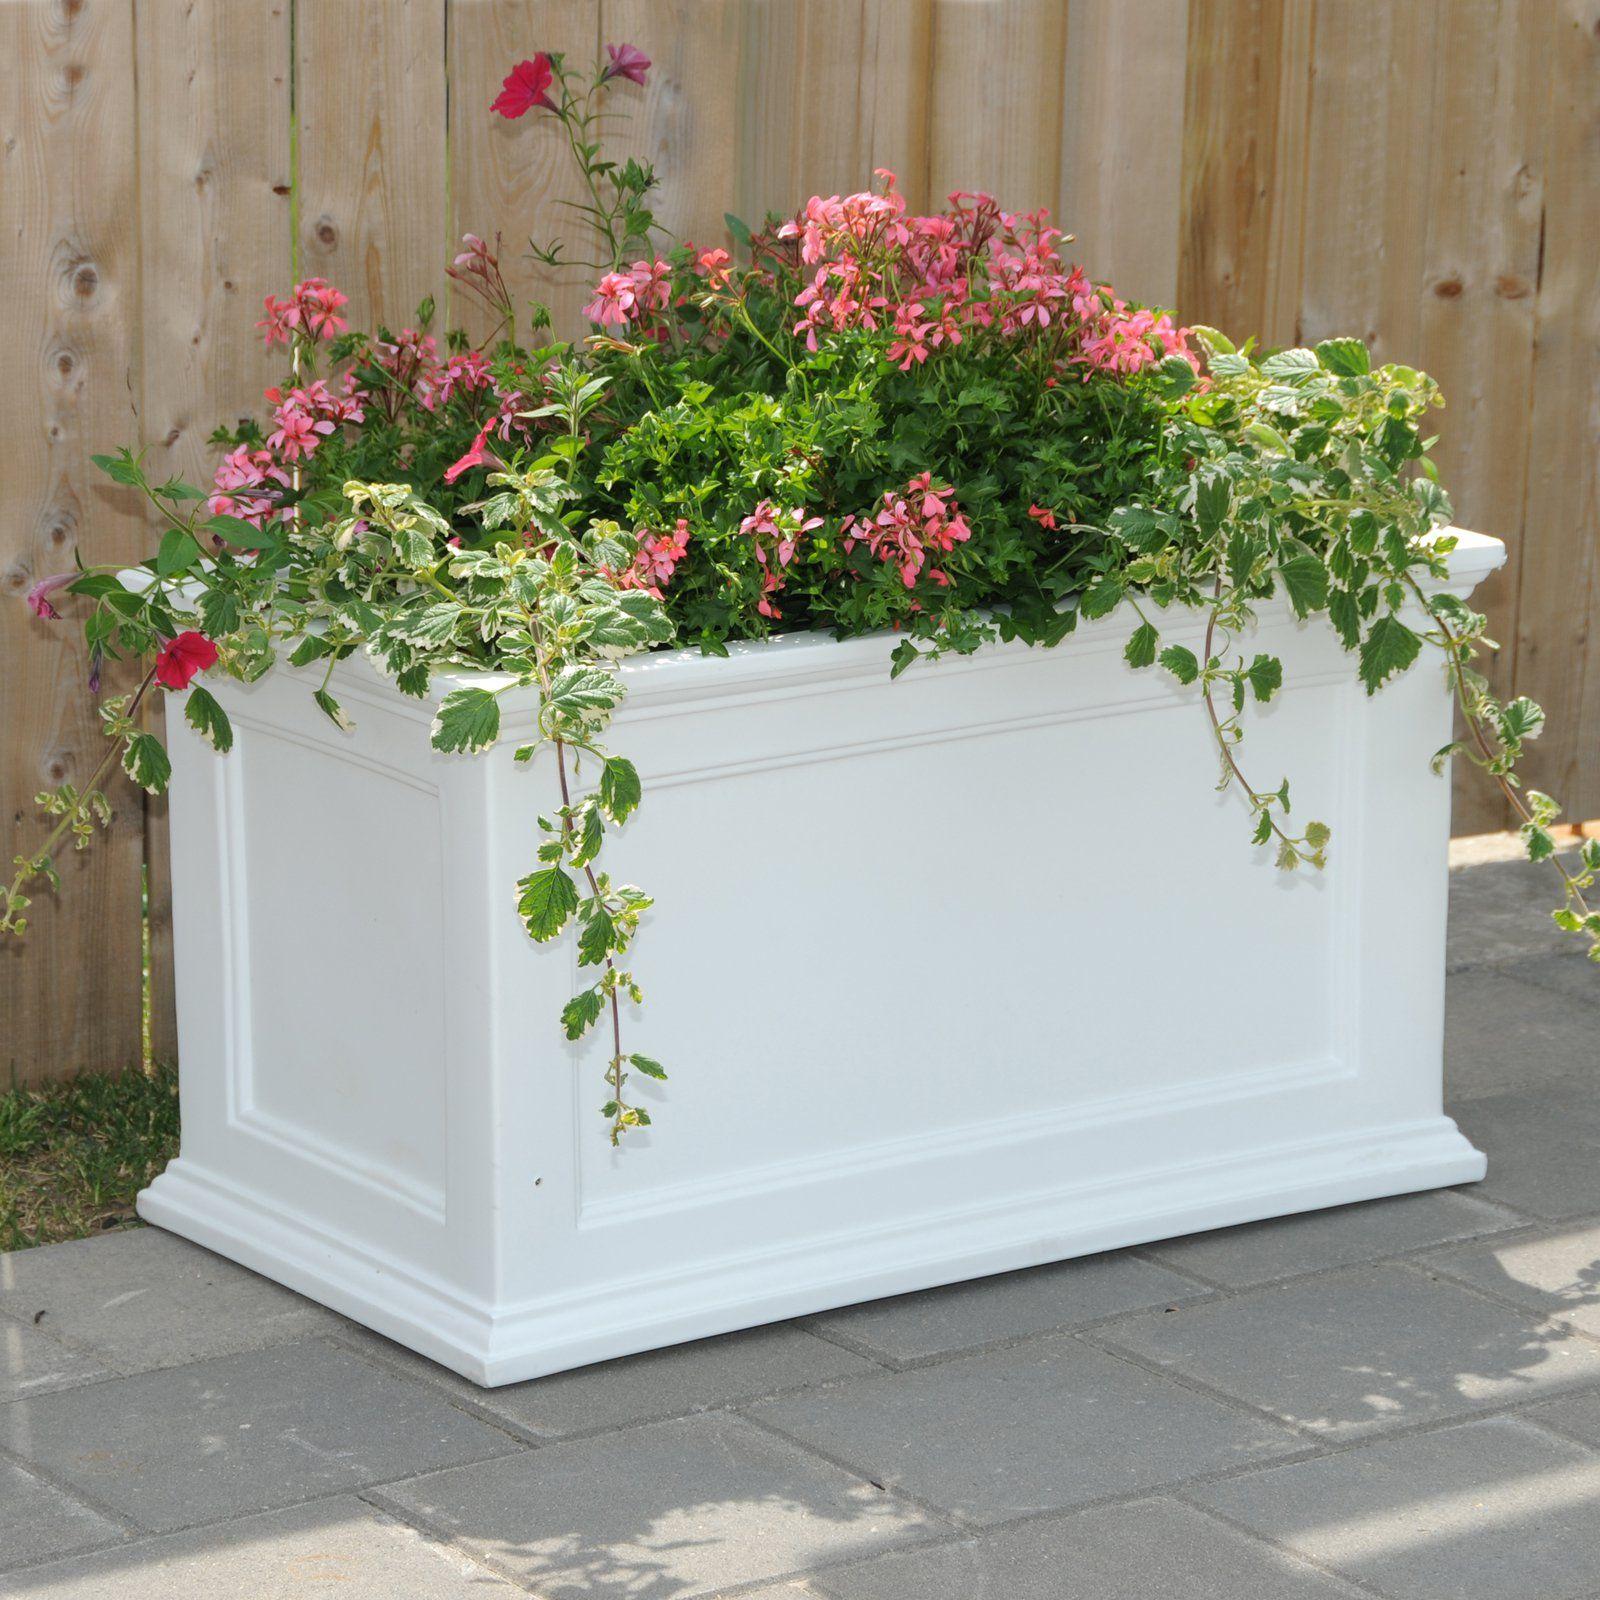 Mayne rectangle polyethylene fairfield patio planter